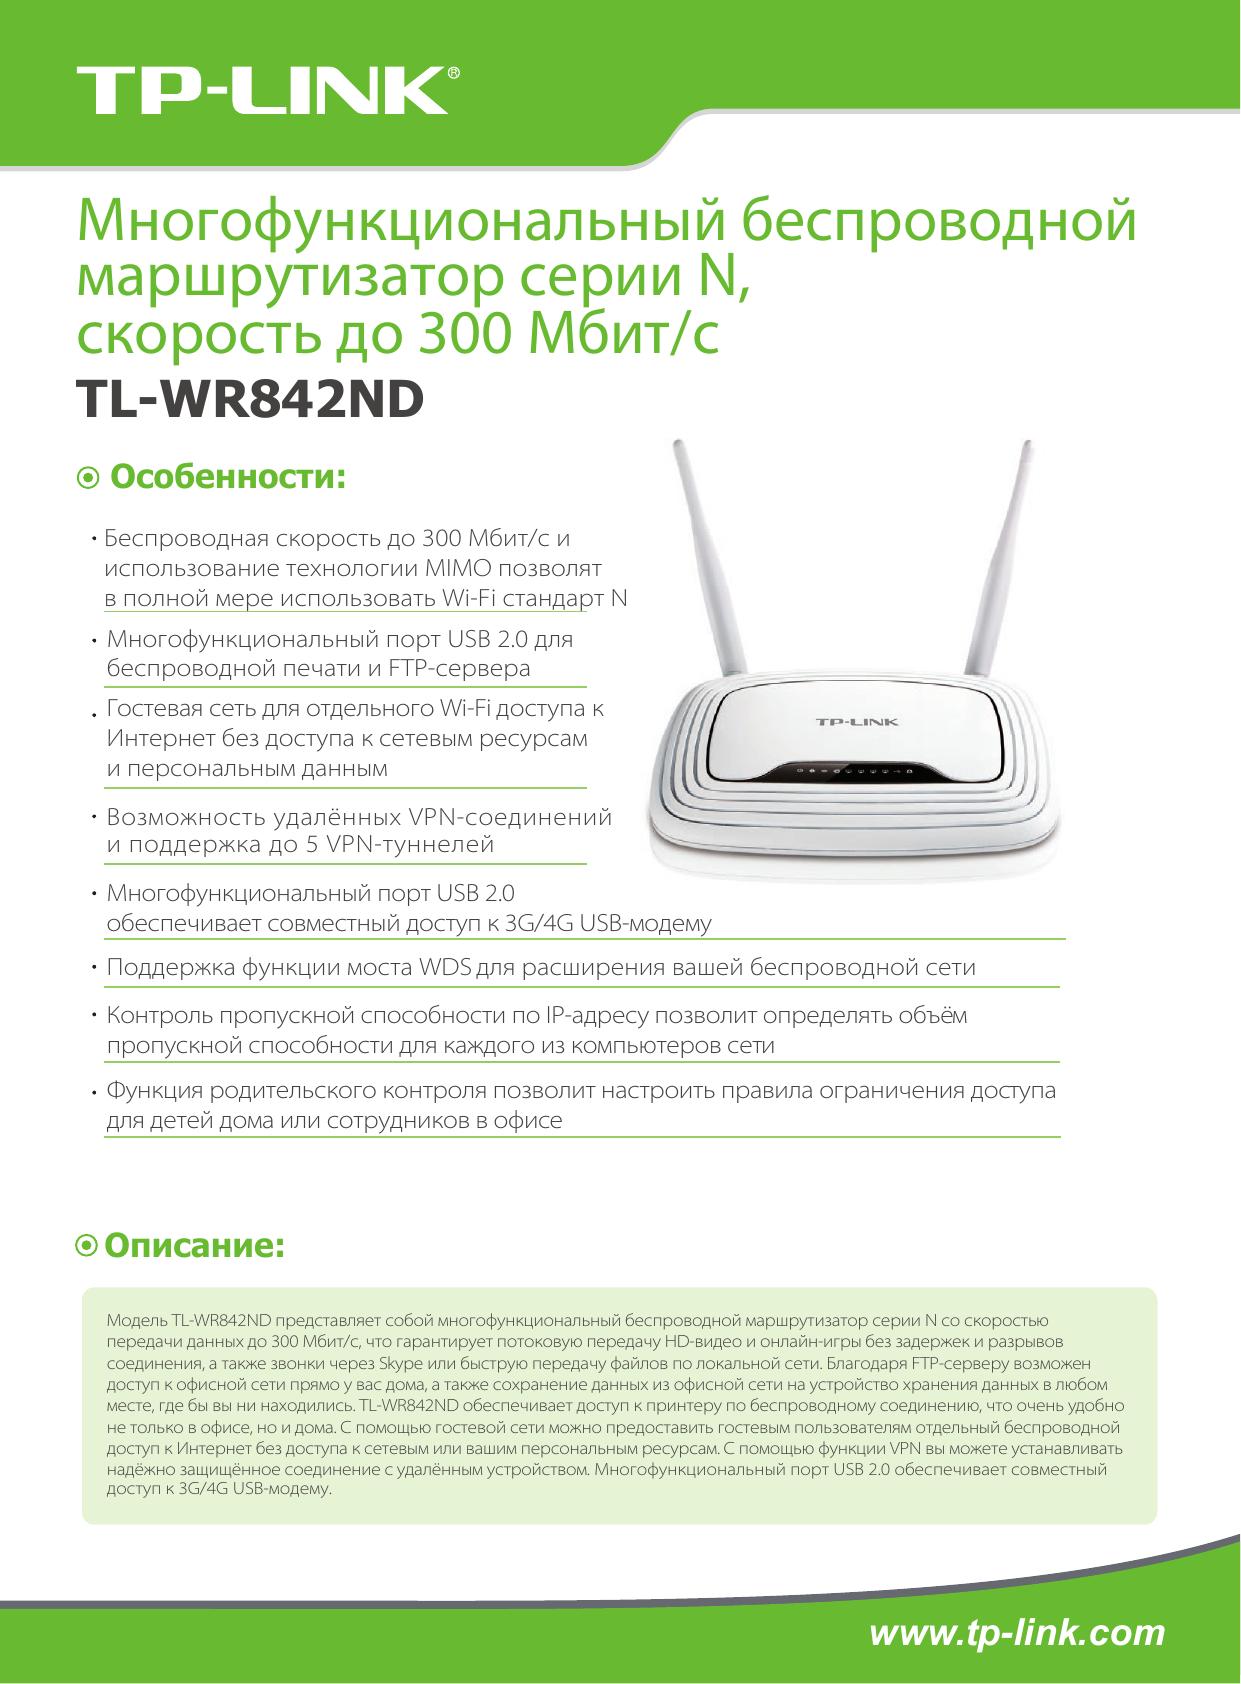 TP-LINK TL-WR842ND V2 ROUTER DRIVERS FOR WINDOWS VISTA